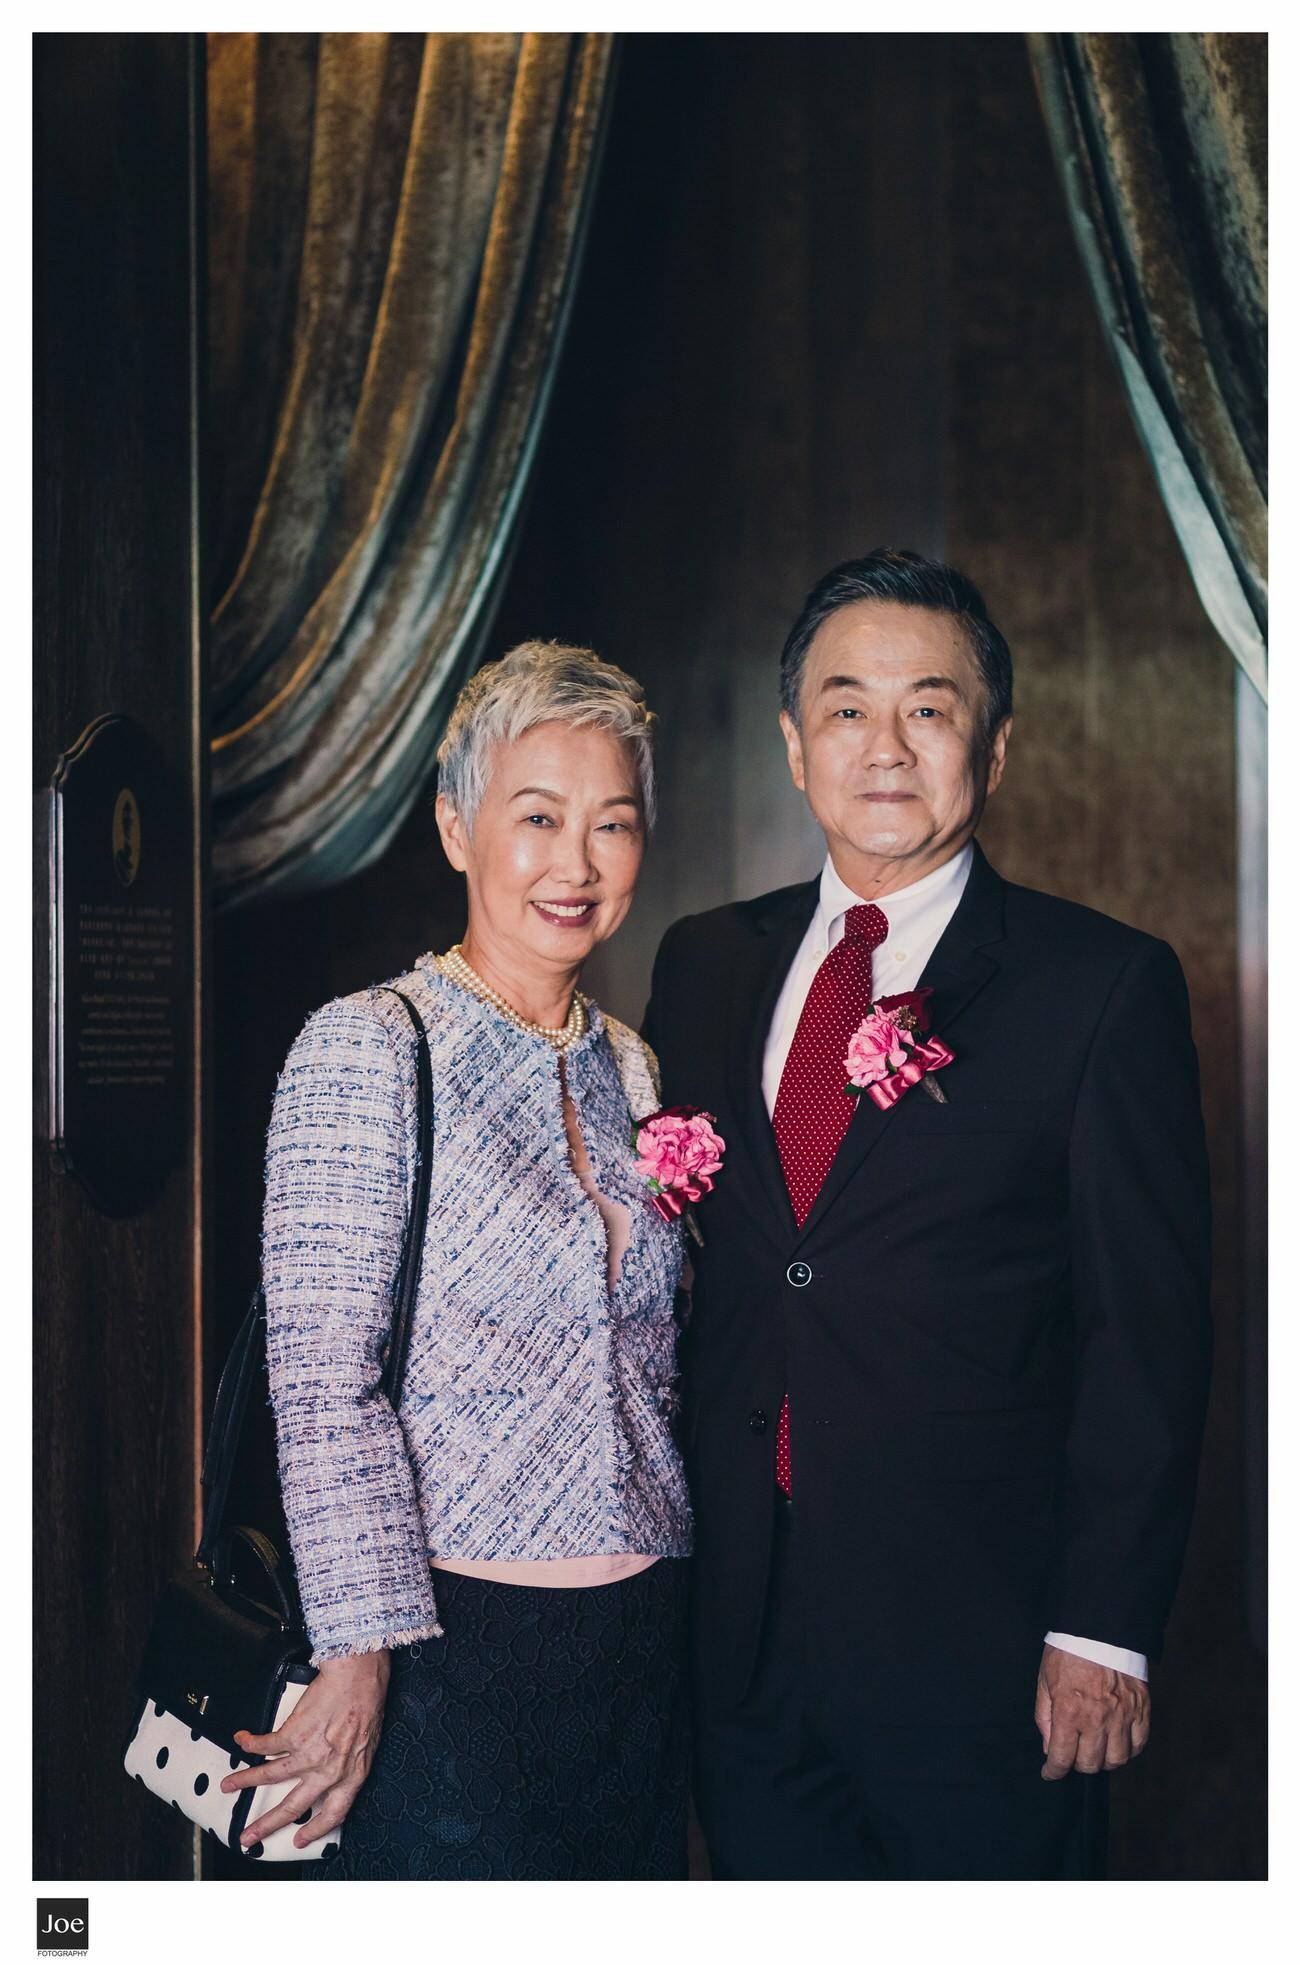 joe-fotography-wedding-photo-palais-de-chine-hotel-005.jpg